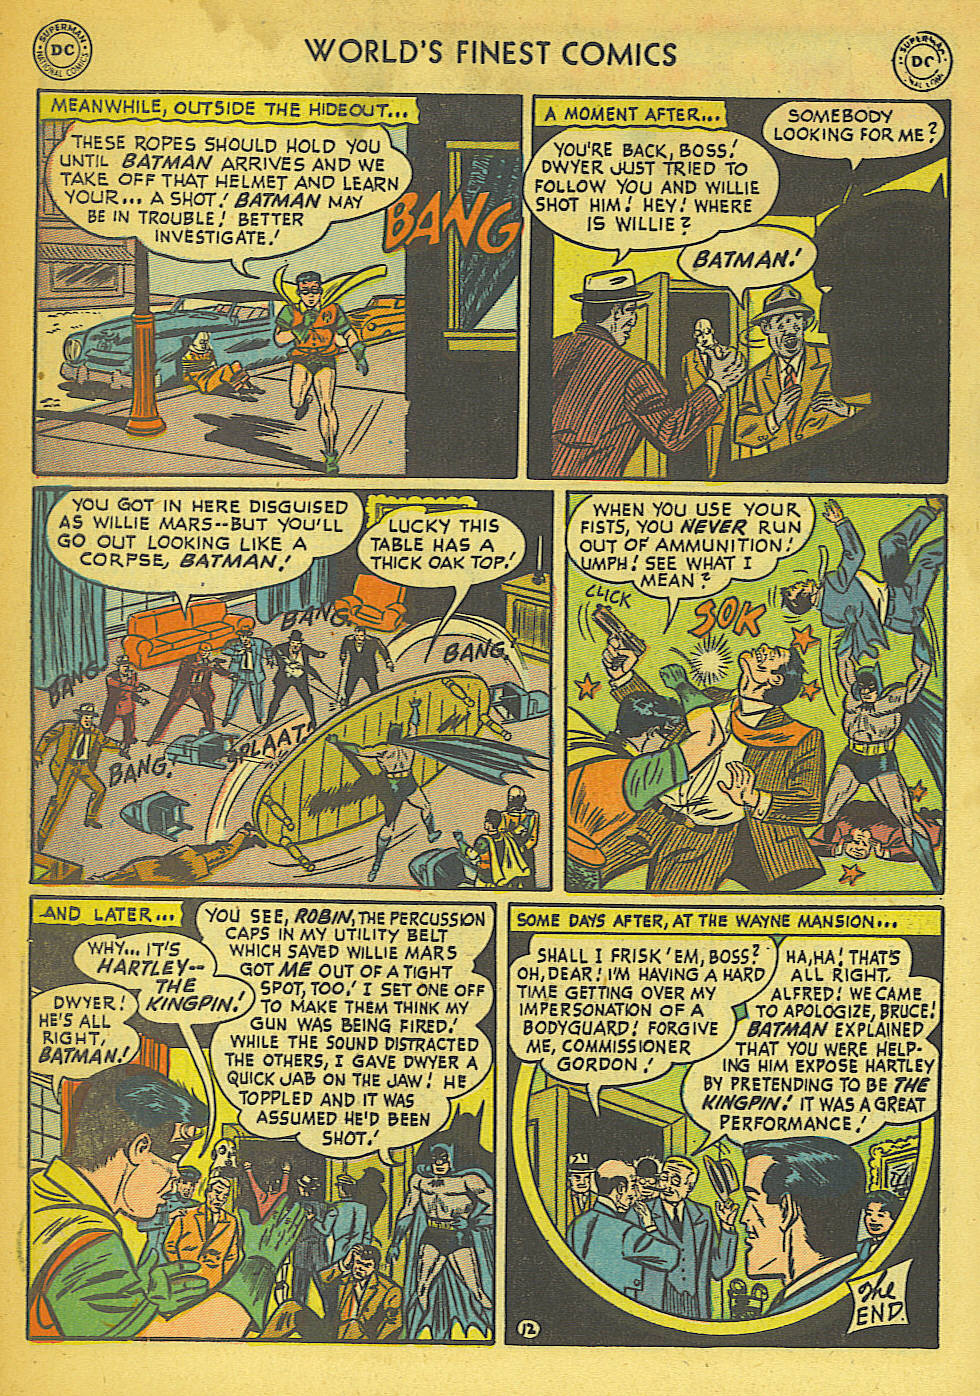 Read online World's Finest Comics comic -  Issue #57 - 64